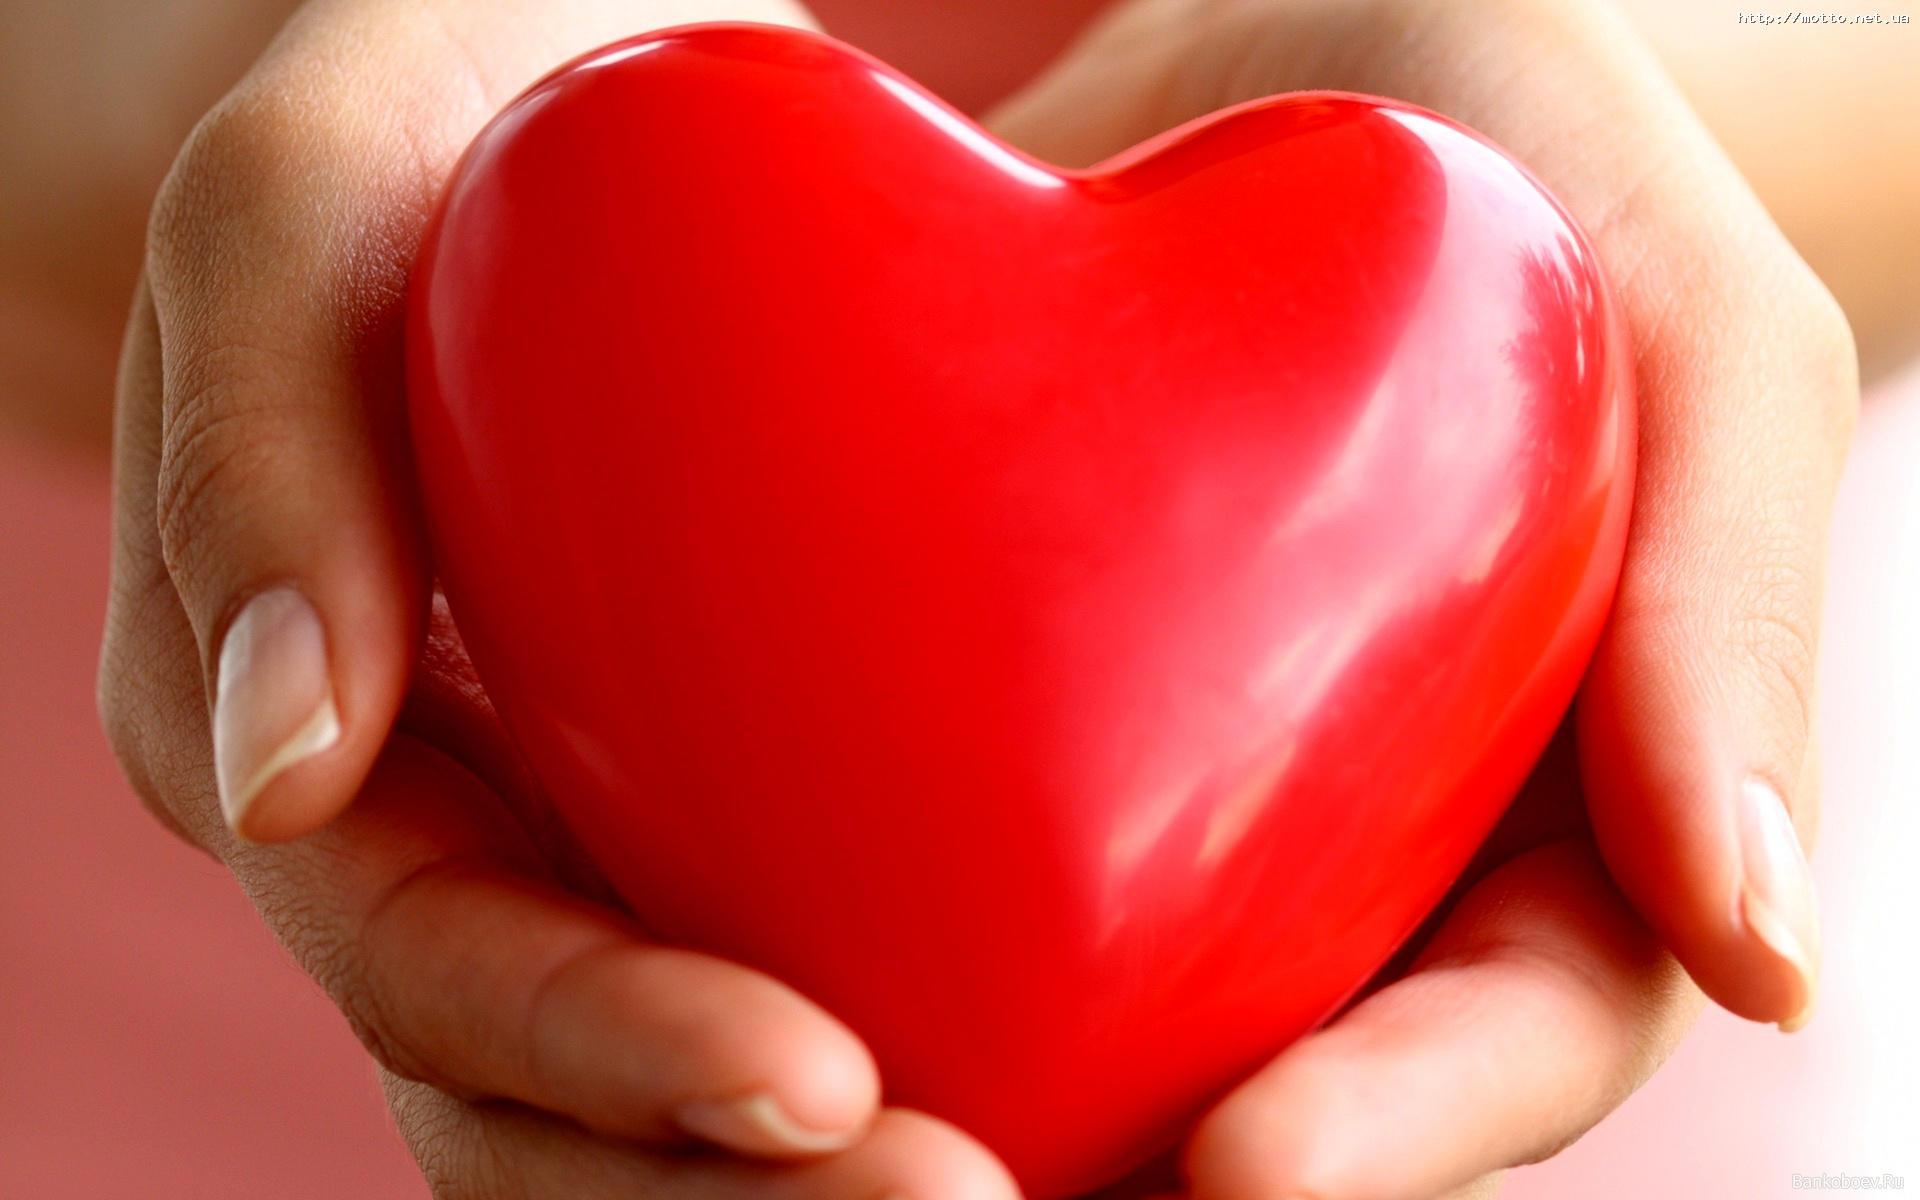 Профилактика инфаркта миокарда — как уберечь себя от проблем с сердцем